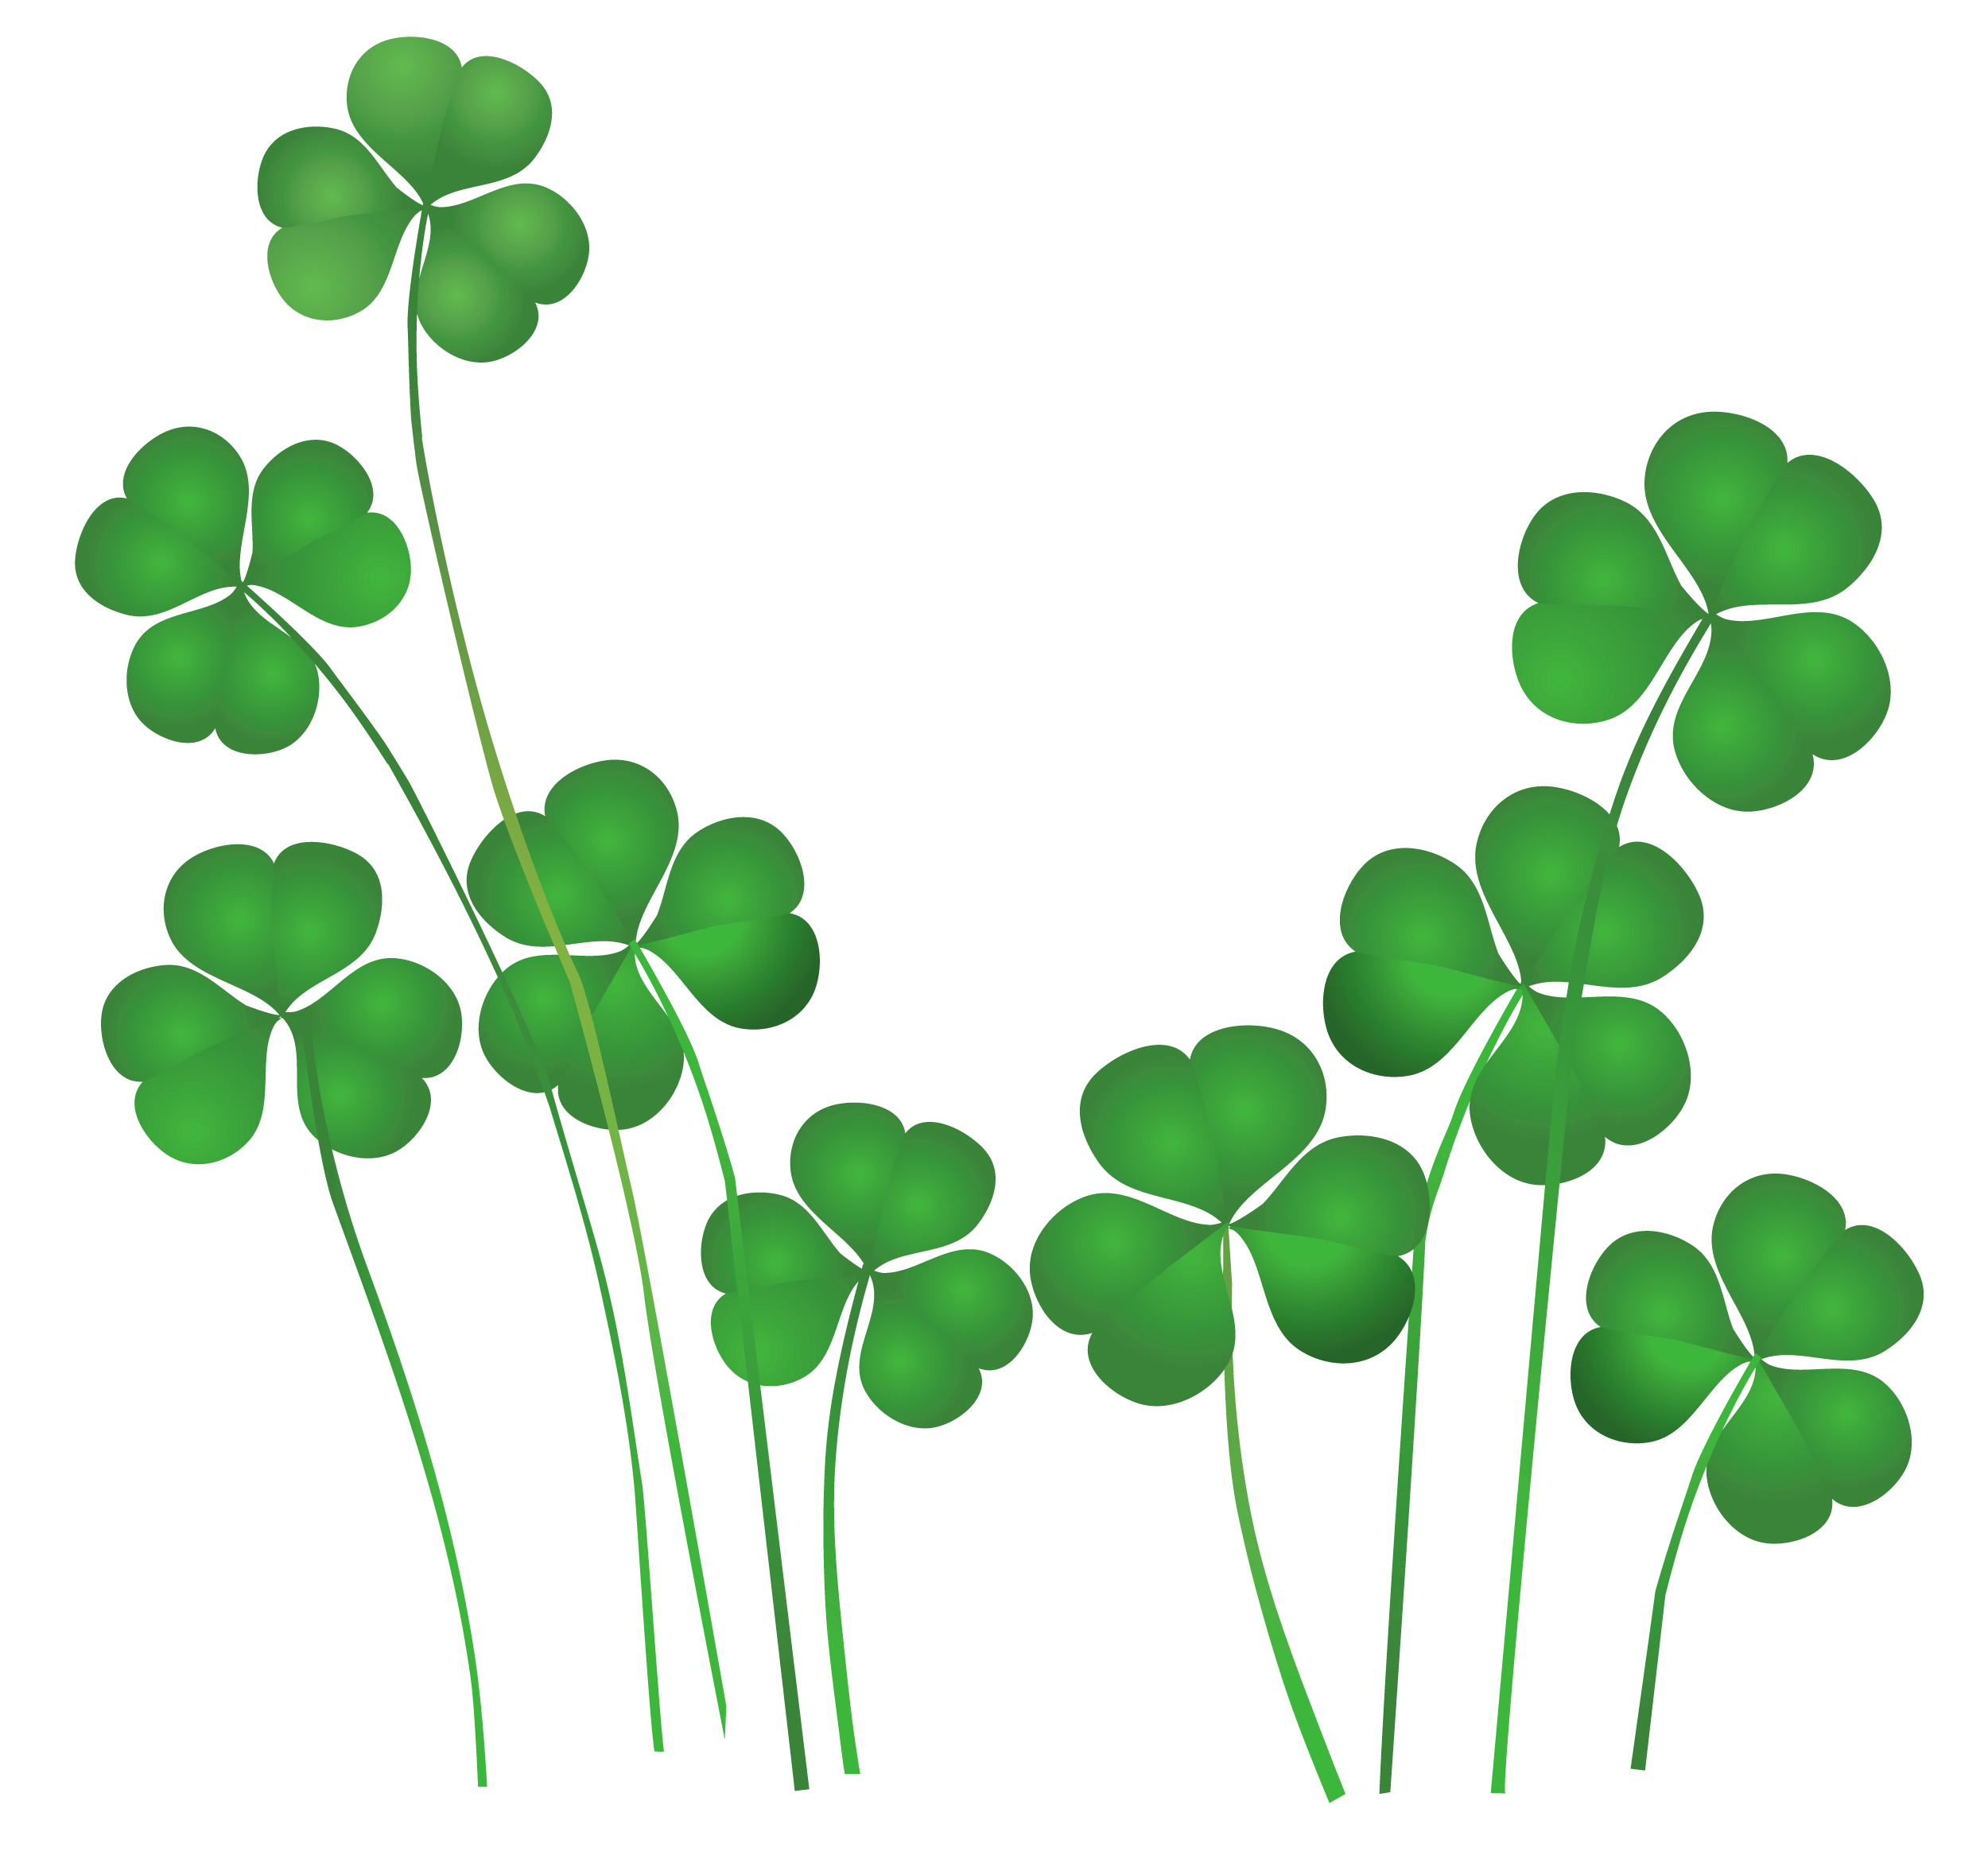 St Patricks Day Shamrock Clip Art N34 free image.